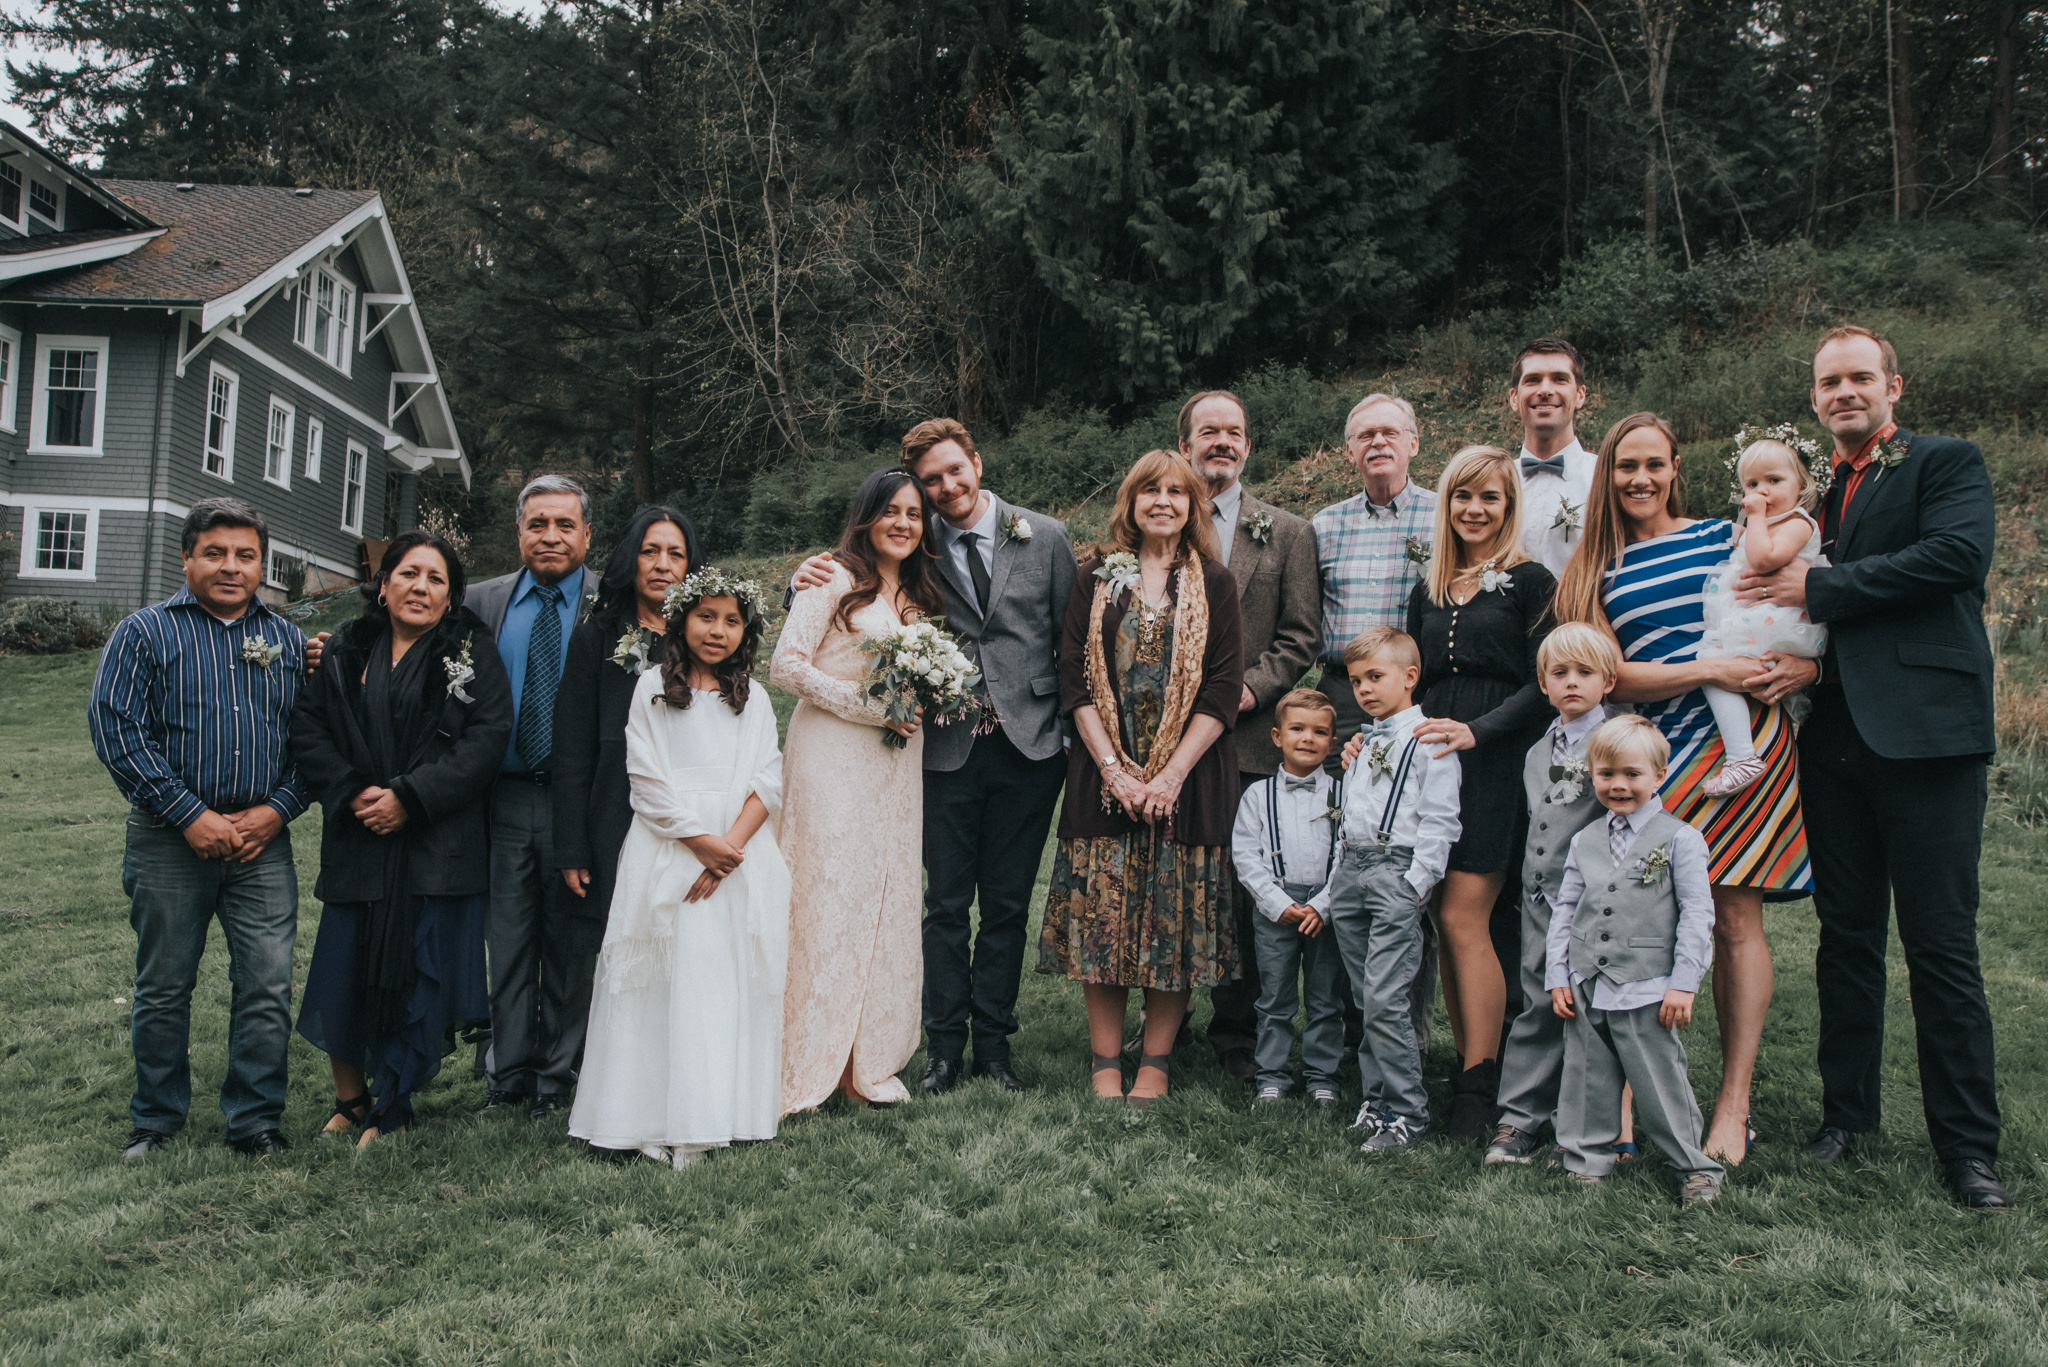 Bellingham wedding Woodstock Farms Vishal Goklani Seattle Wedding Photographer025.JPG